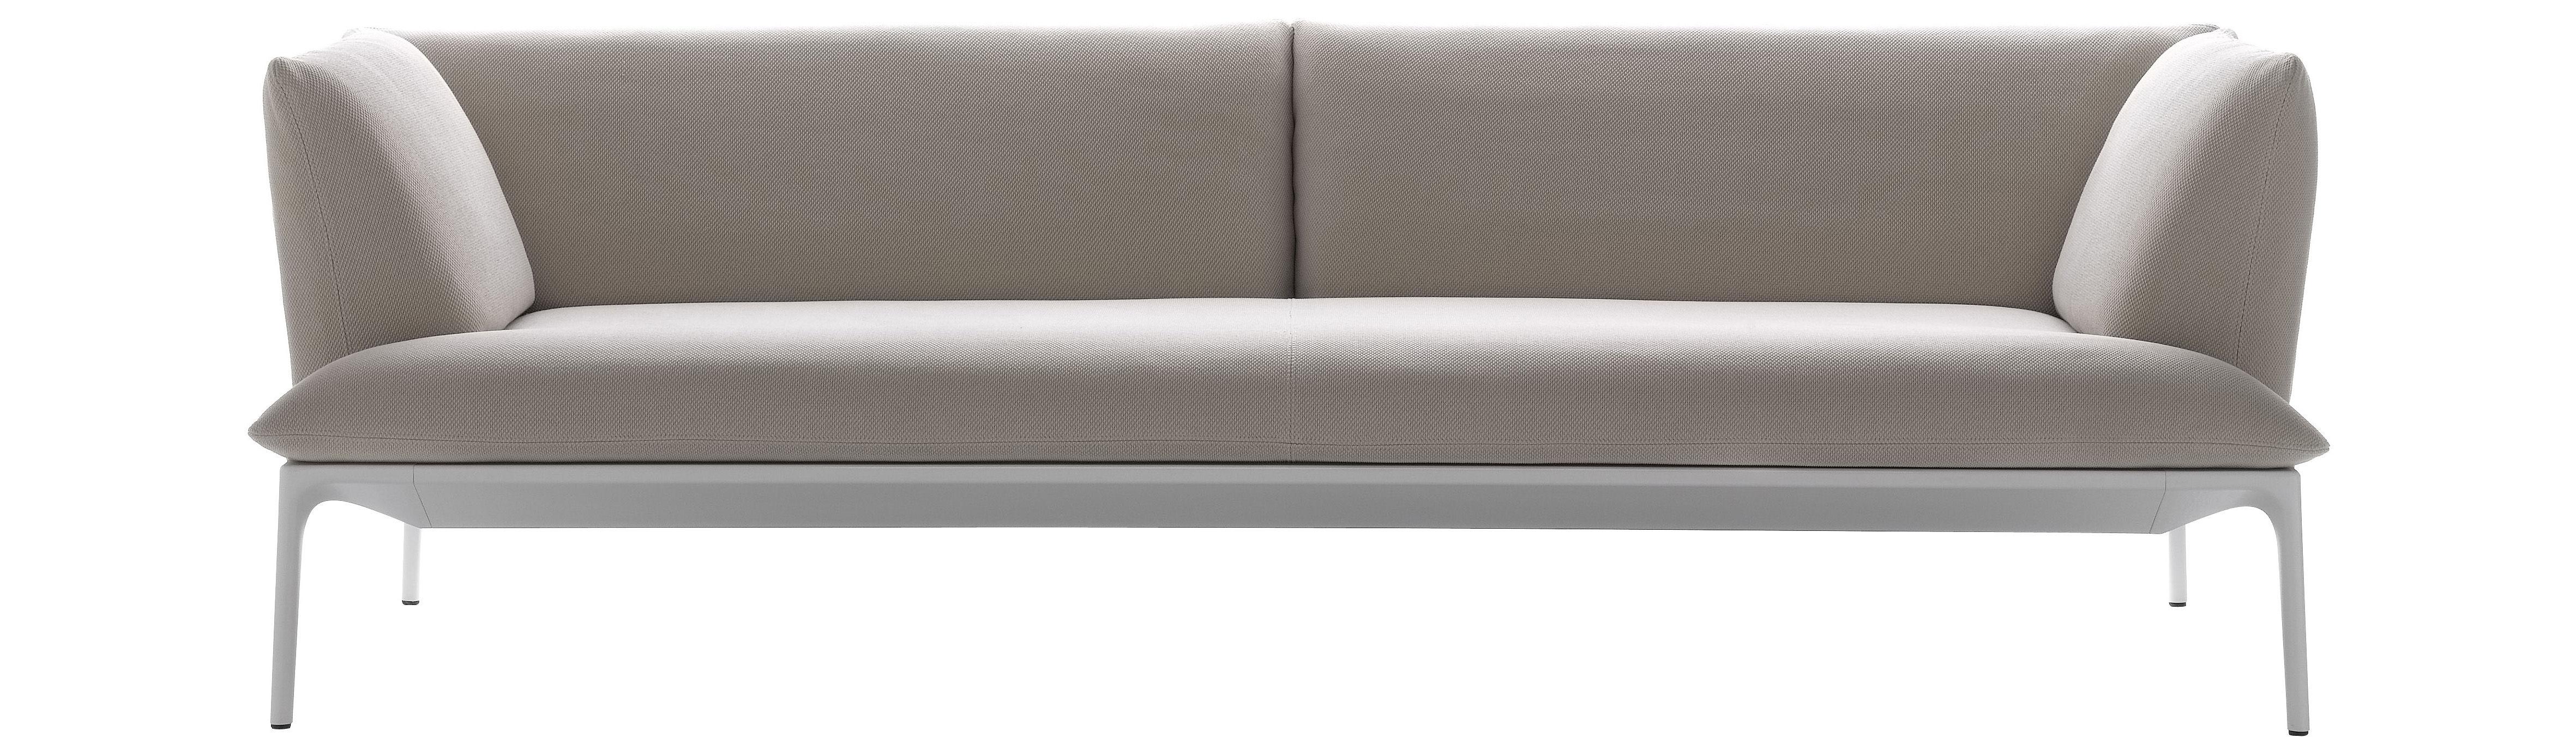 Möbel - Sofas - Yale Sofa 2-Sitzer - L 160 cm - MDF Italia - Beige / Gestell weiß - 2-Sitzer - Aluminium, Gewebe